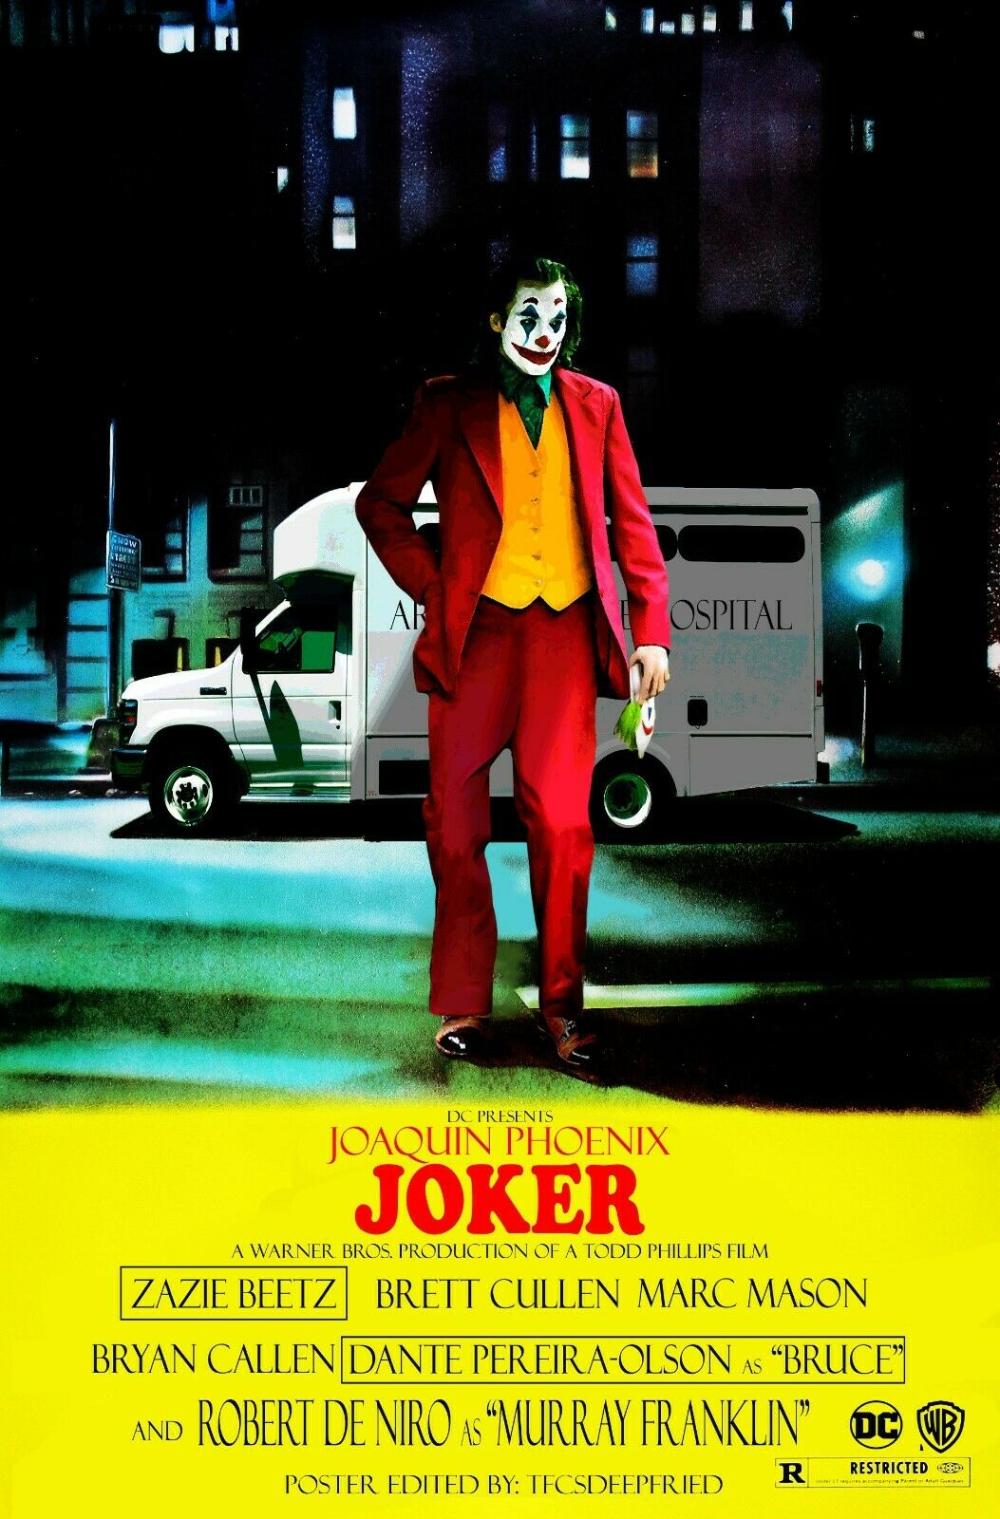 Movie Poster 2019 Dc Comic S And Warner Bros Joker